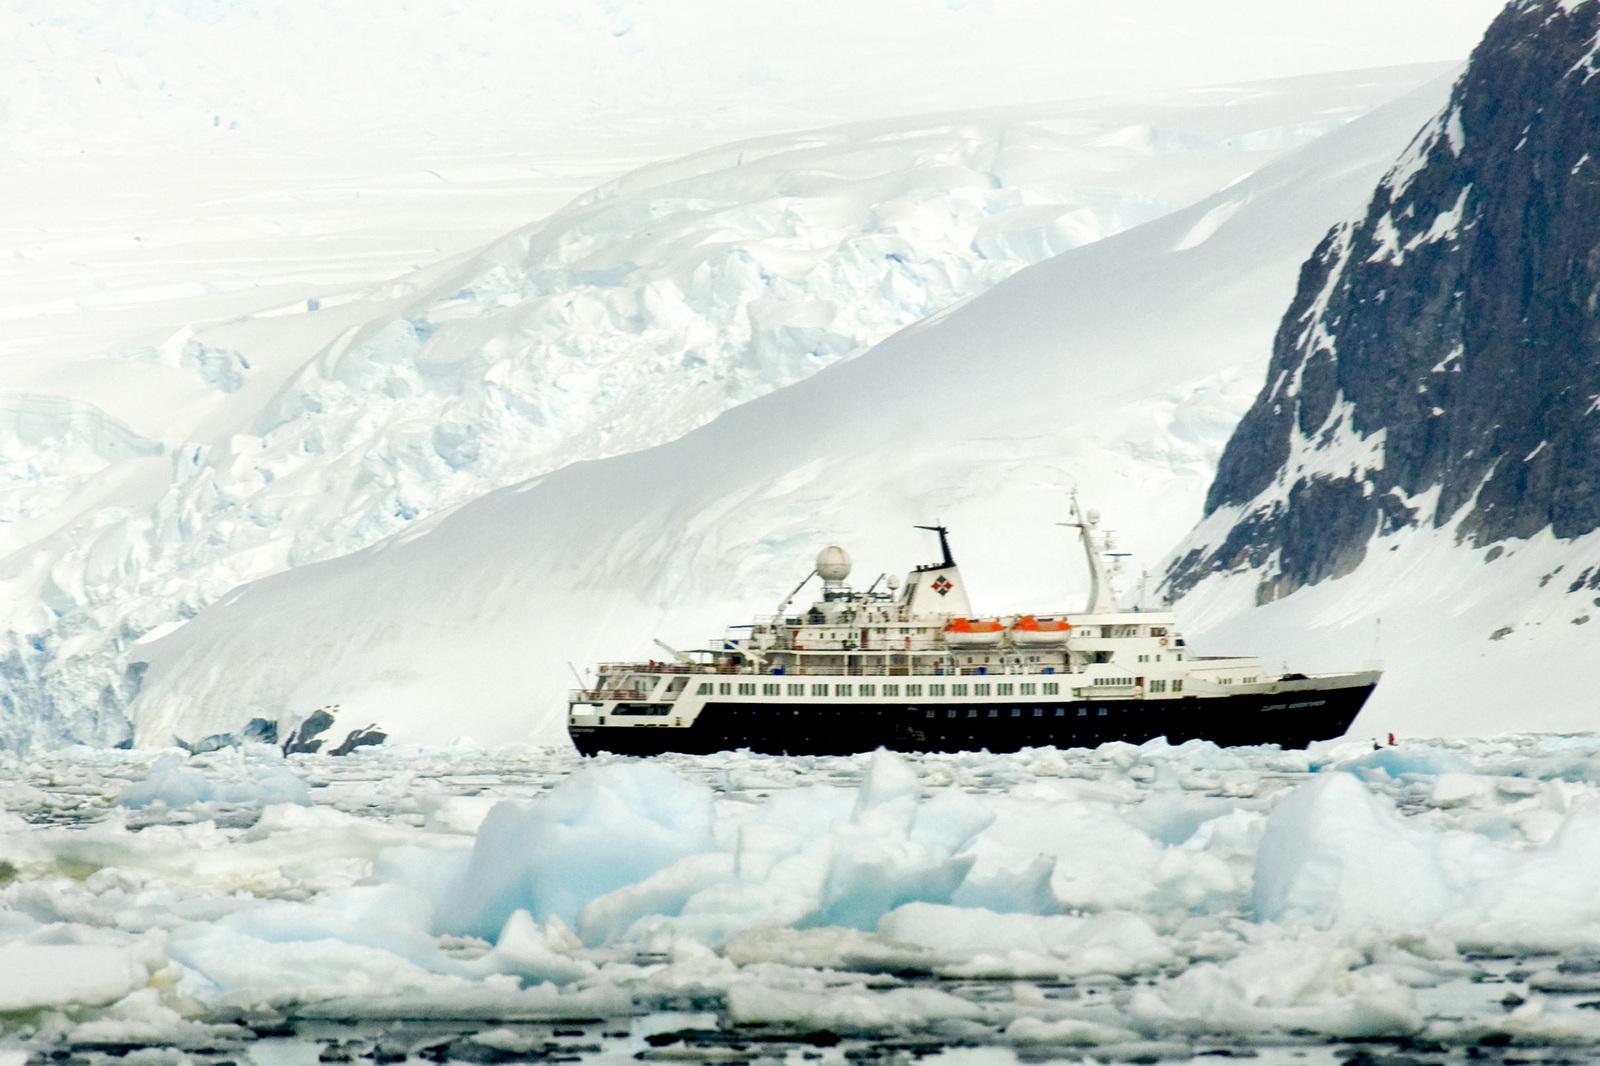 A ship at Pleneau Island off the coast of Antarctica.(Photo © Rick McEwan).